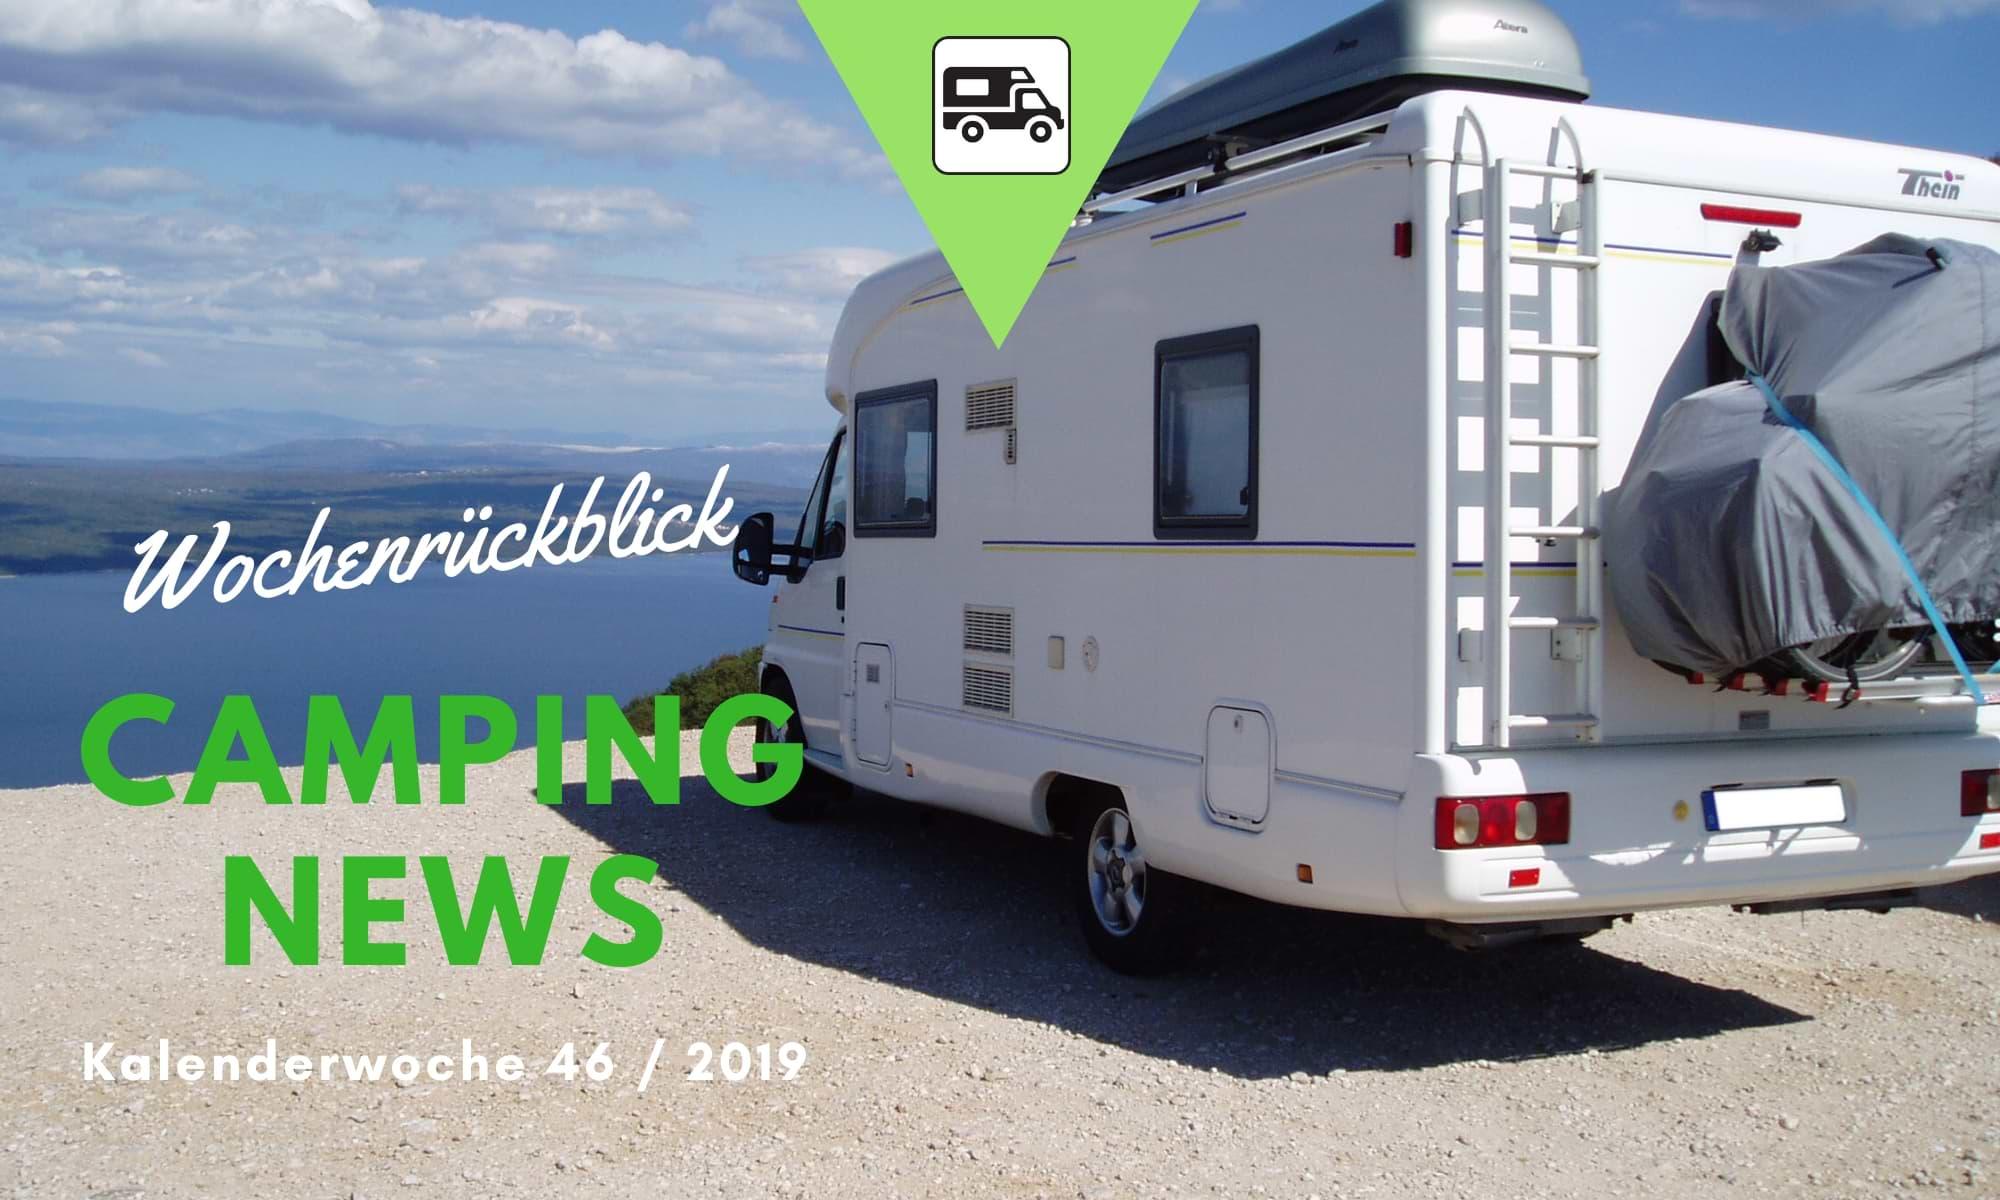 Wochenrückblick Camping News KW46-2019